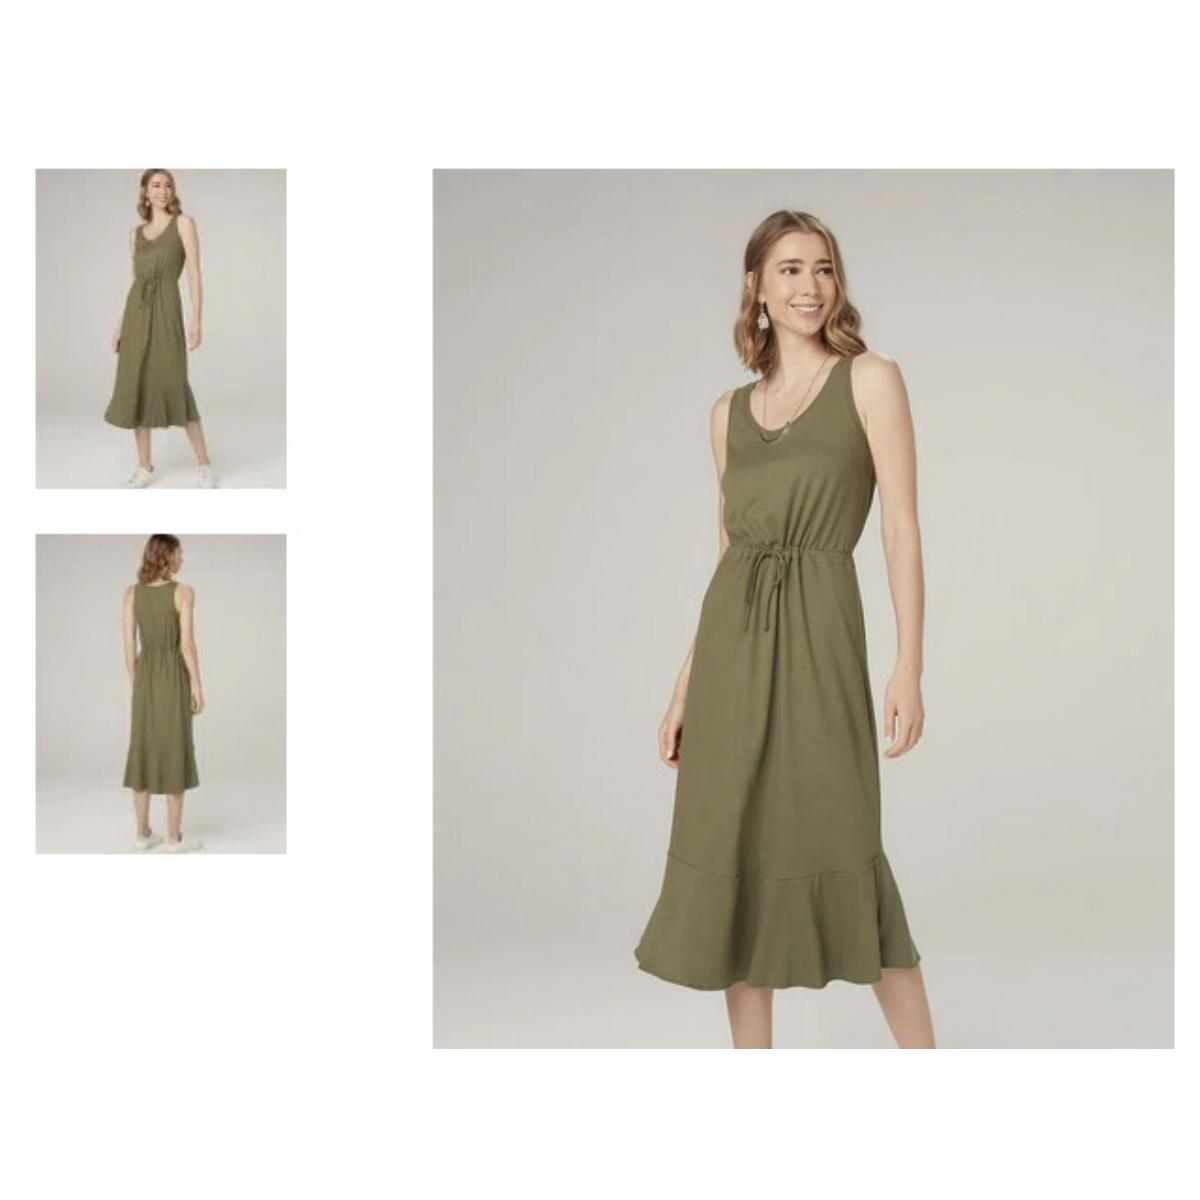 Vestido Feminino Dzarm 6q43 Eacen Verde